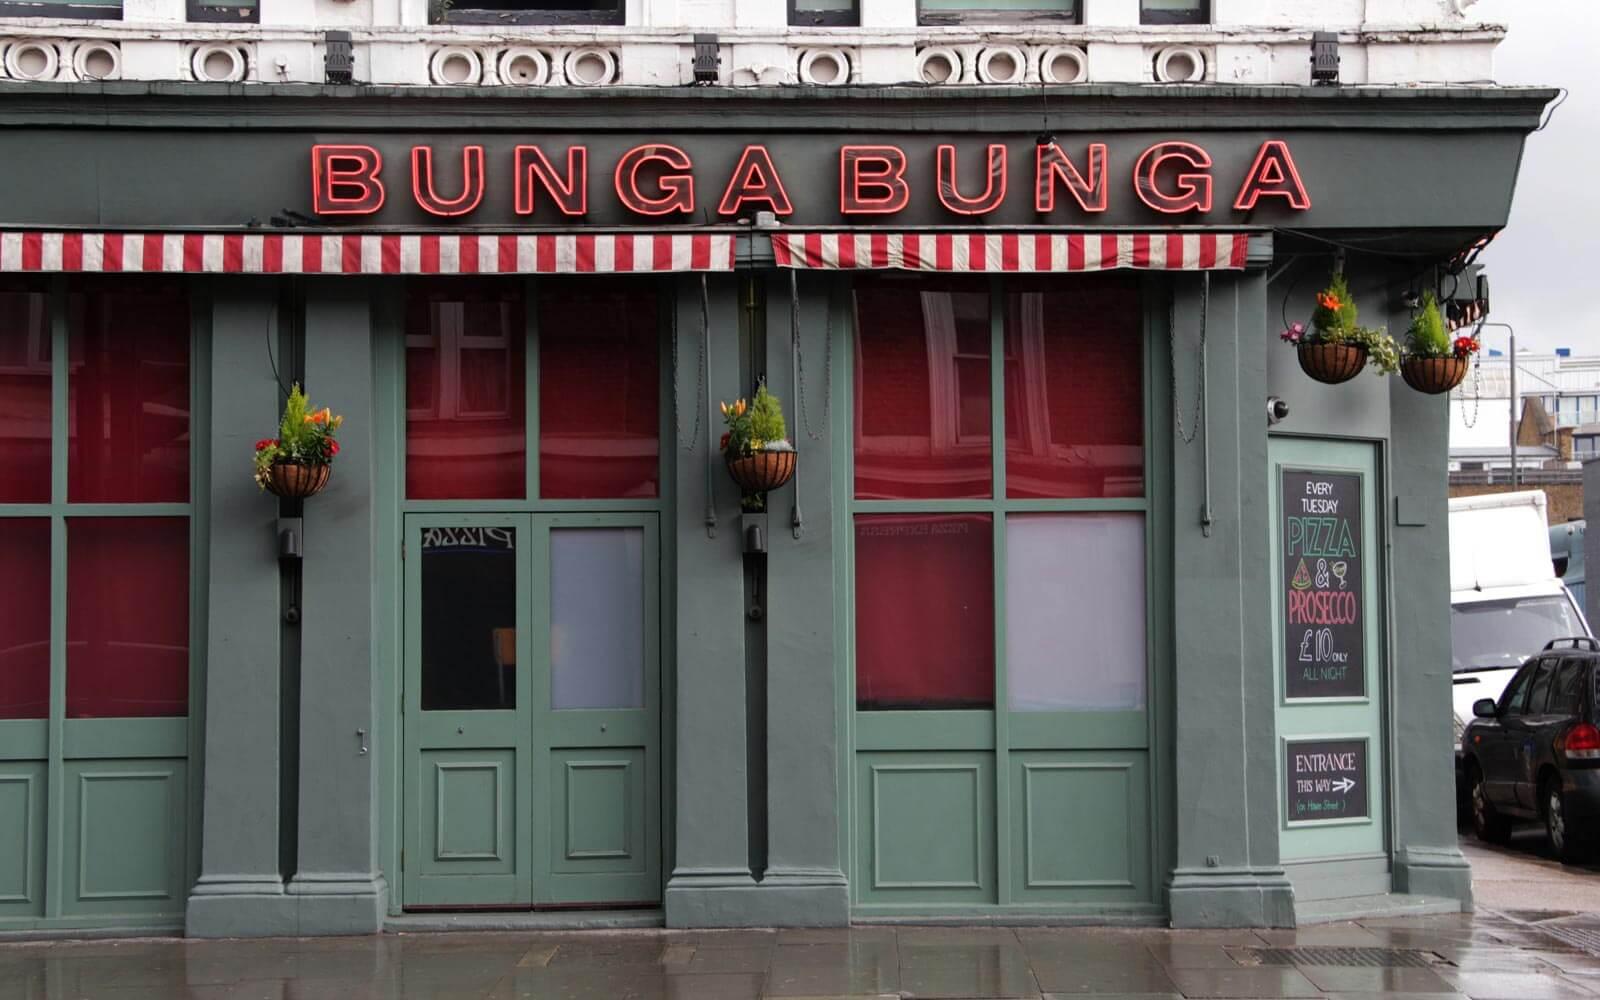 Bunga Bunga Restaurant